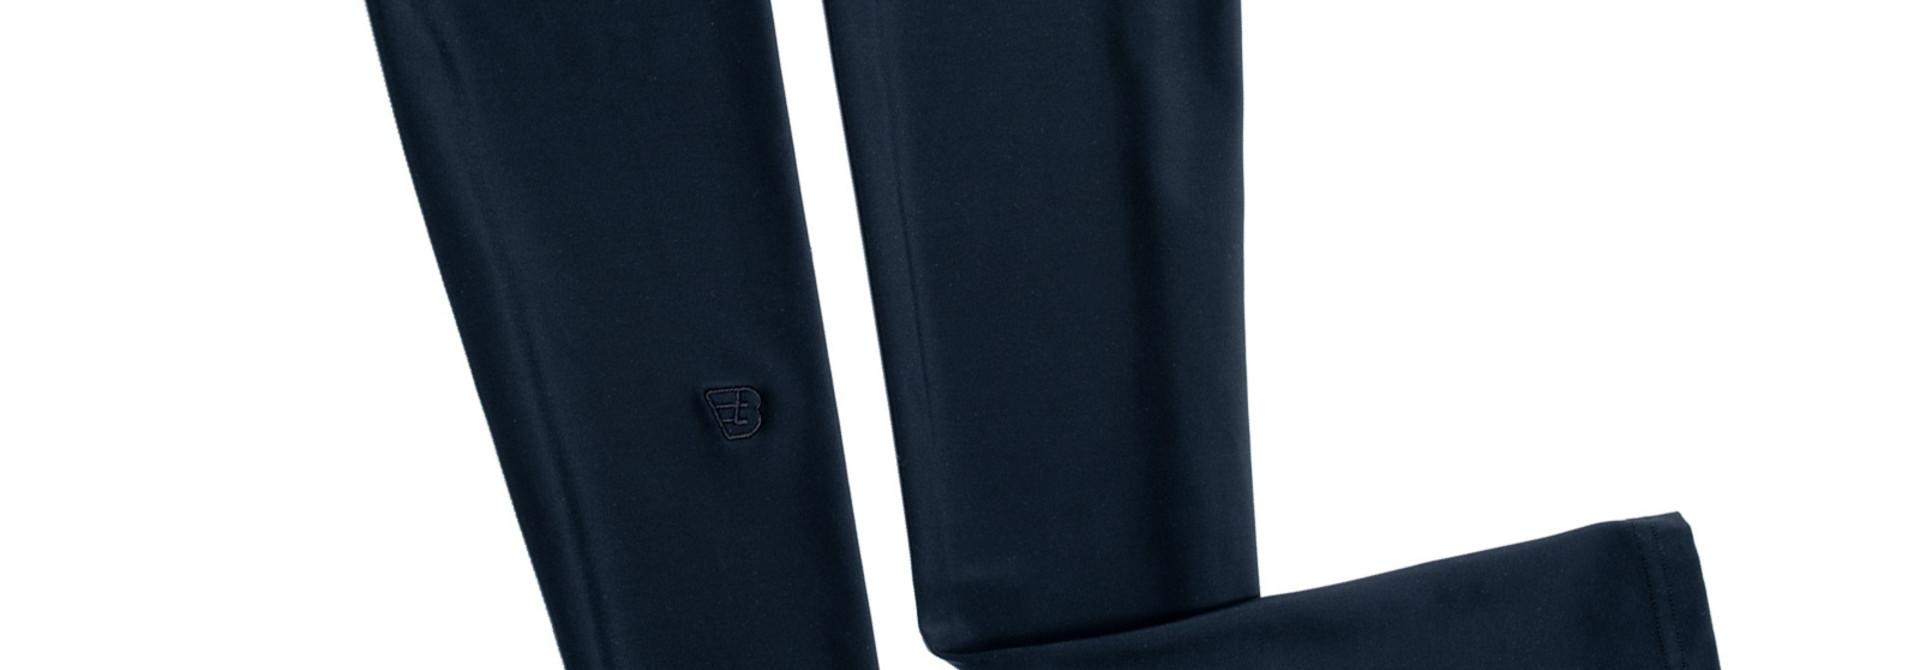 Rouleur Leg Screens | Black